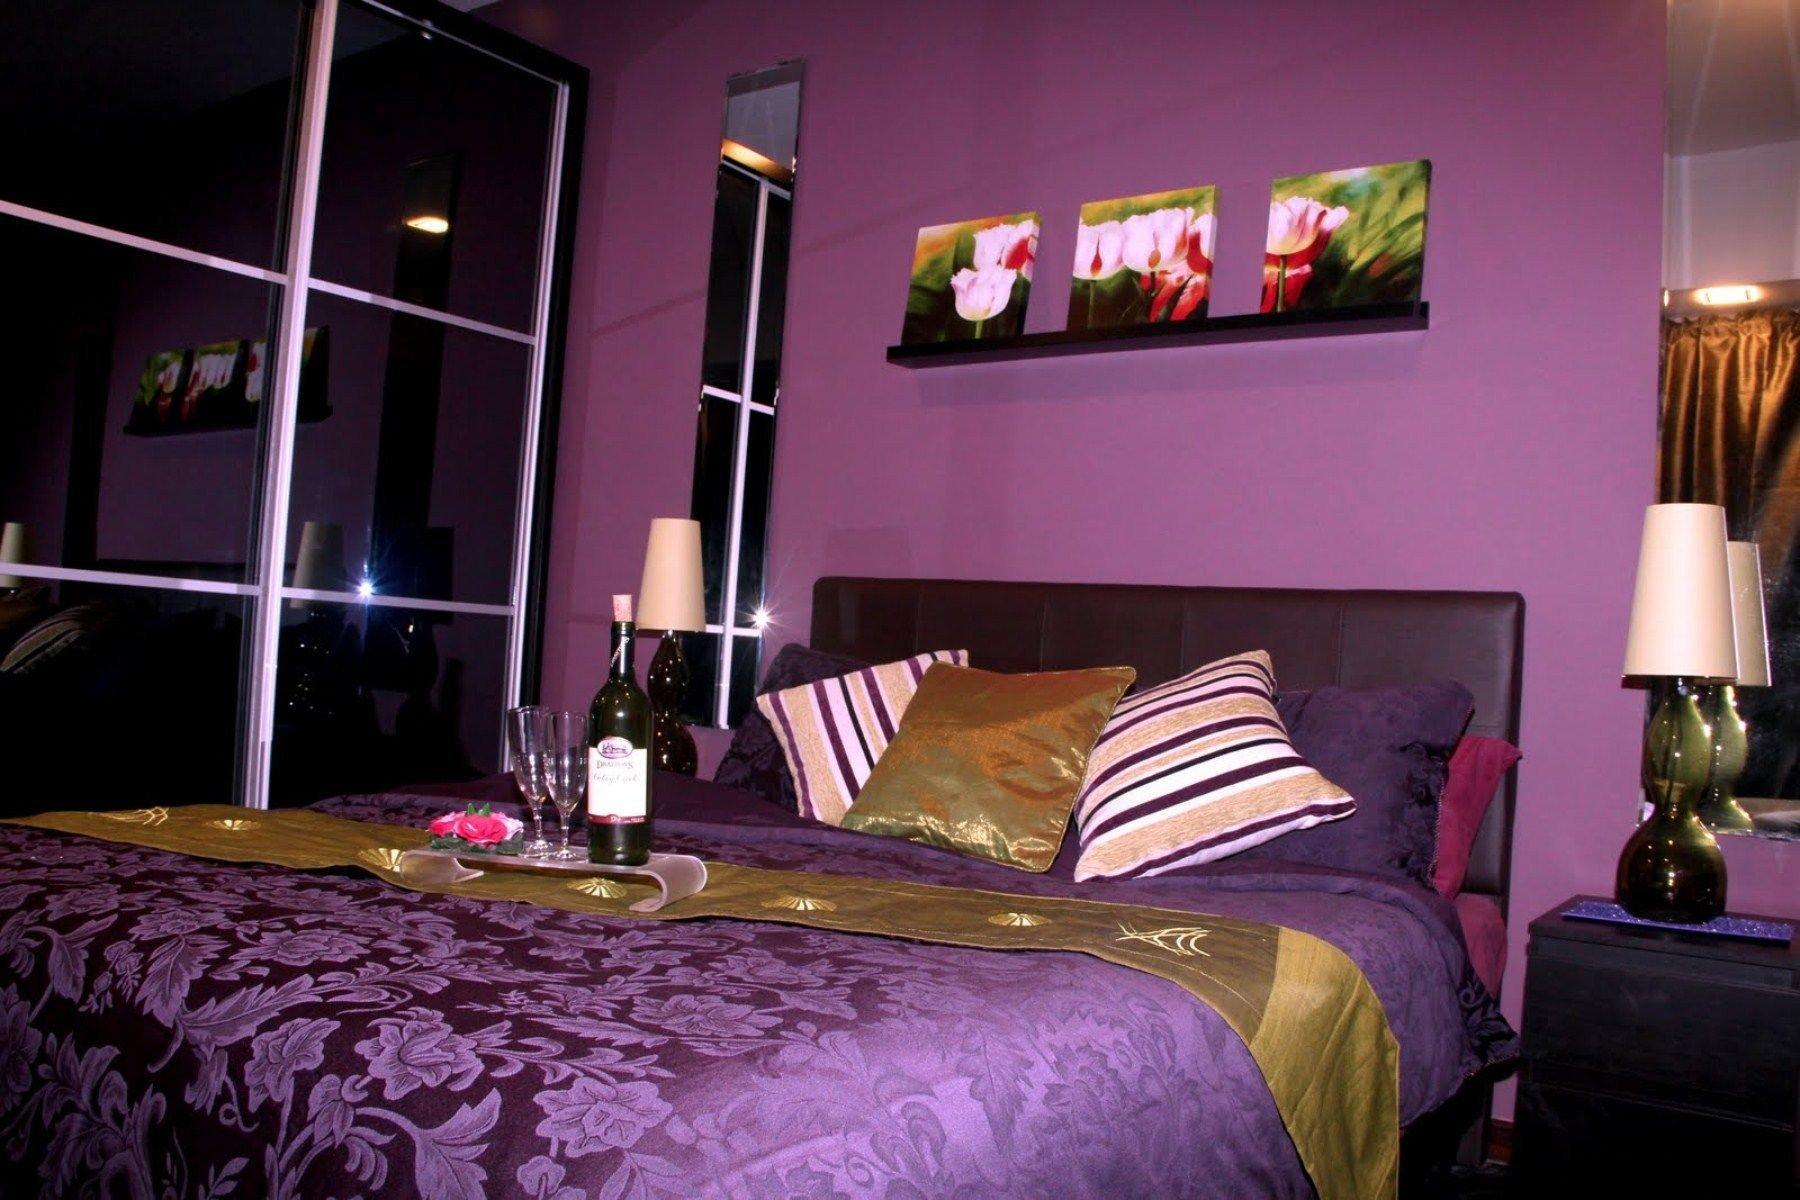 Black and Silver Bedroom Ideas Luxury Bedroom Romantic Purple Bedroom Ideas for Valentine Days